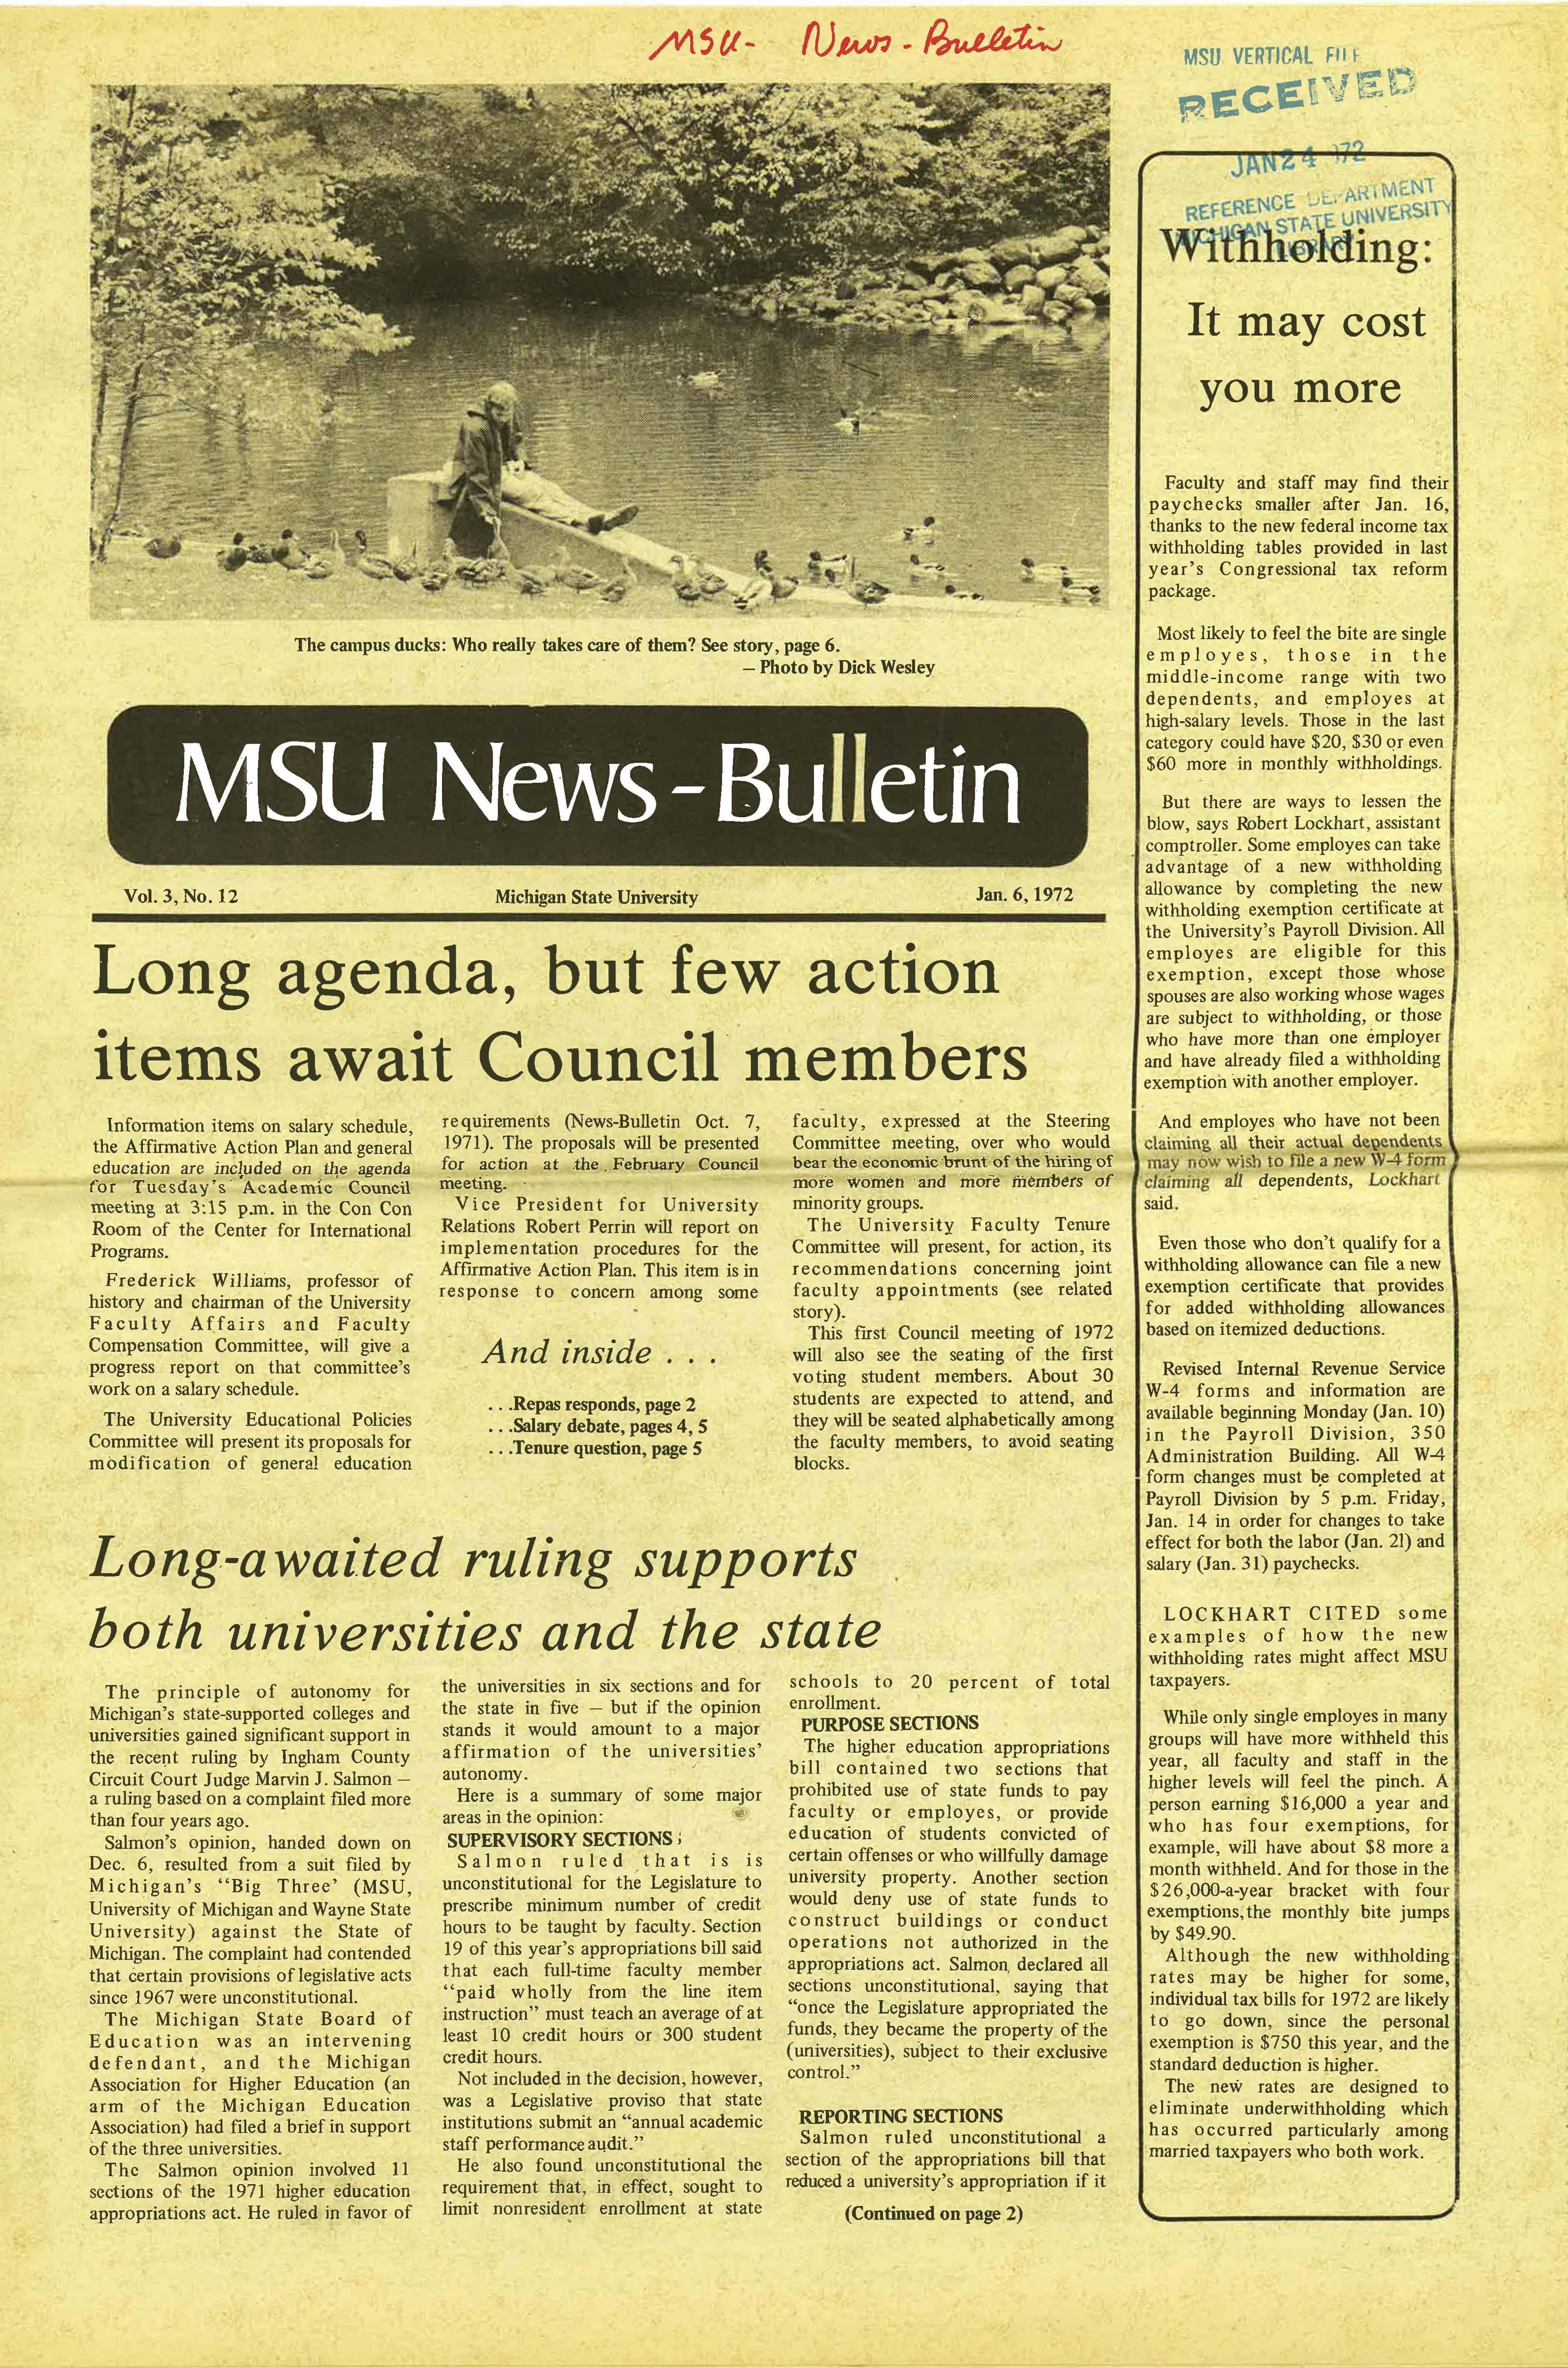 MSU News Bulletin, vol. 3, No. 14,January 20, 1972